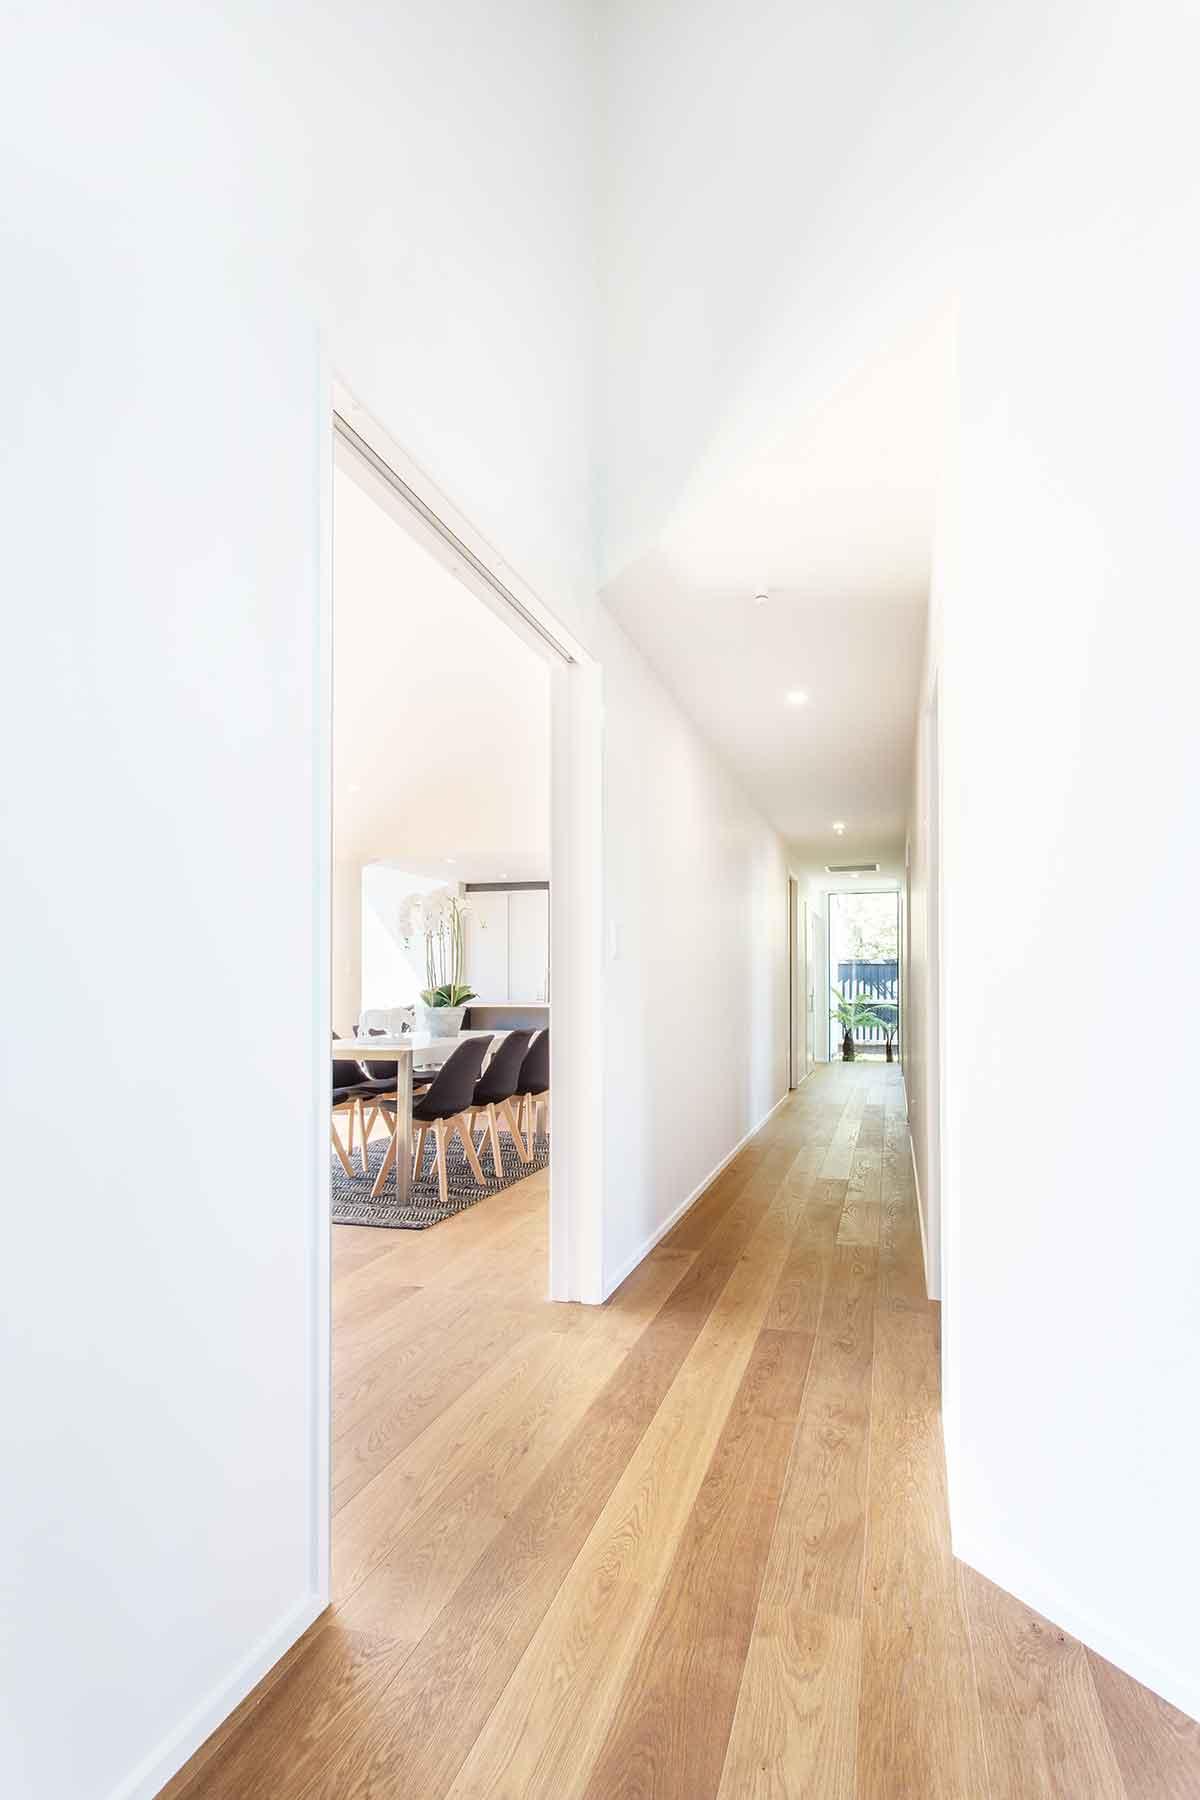 Bennett Street - Registered Master Builder Silver House of the Year Award – Christchurch New Architectural Build 2017 - Fleetwood Construction Ltd.